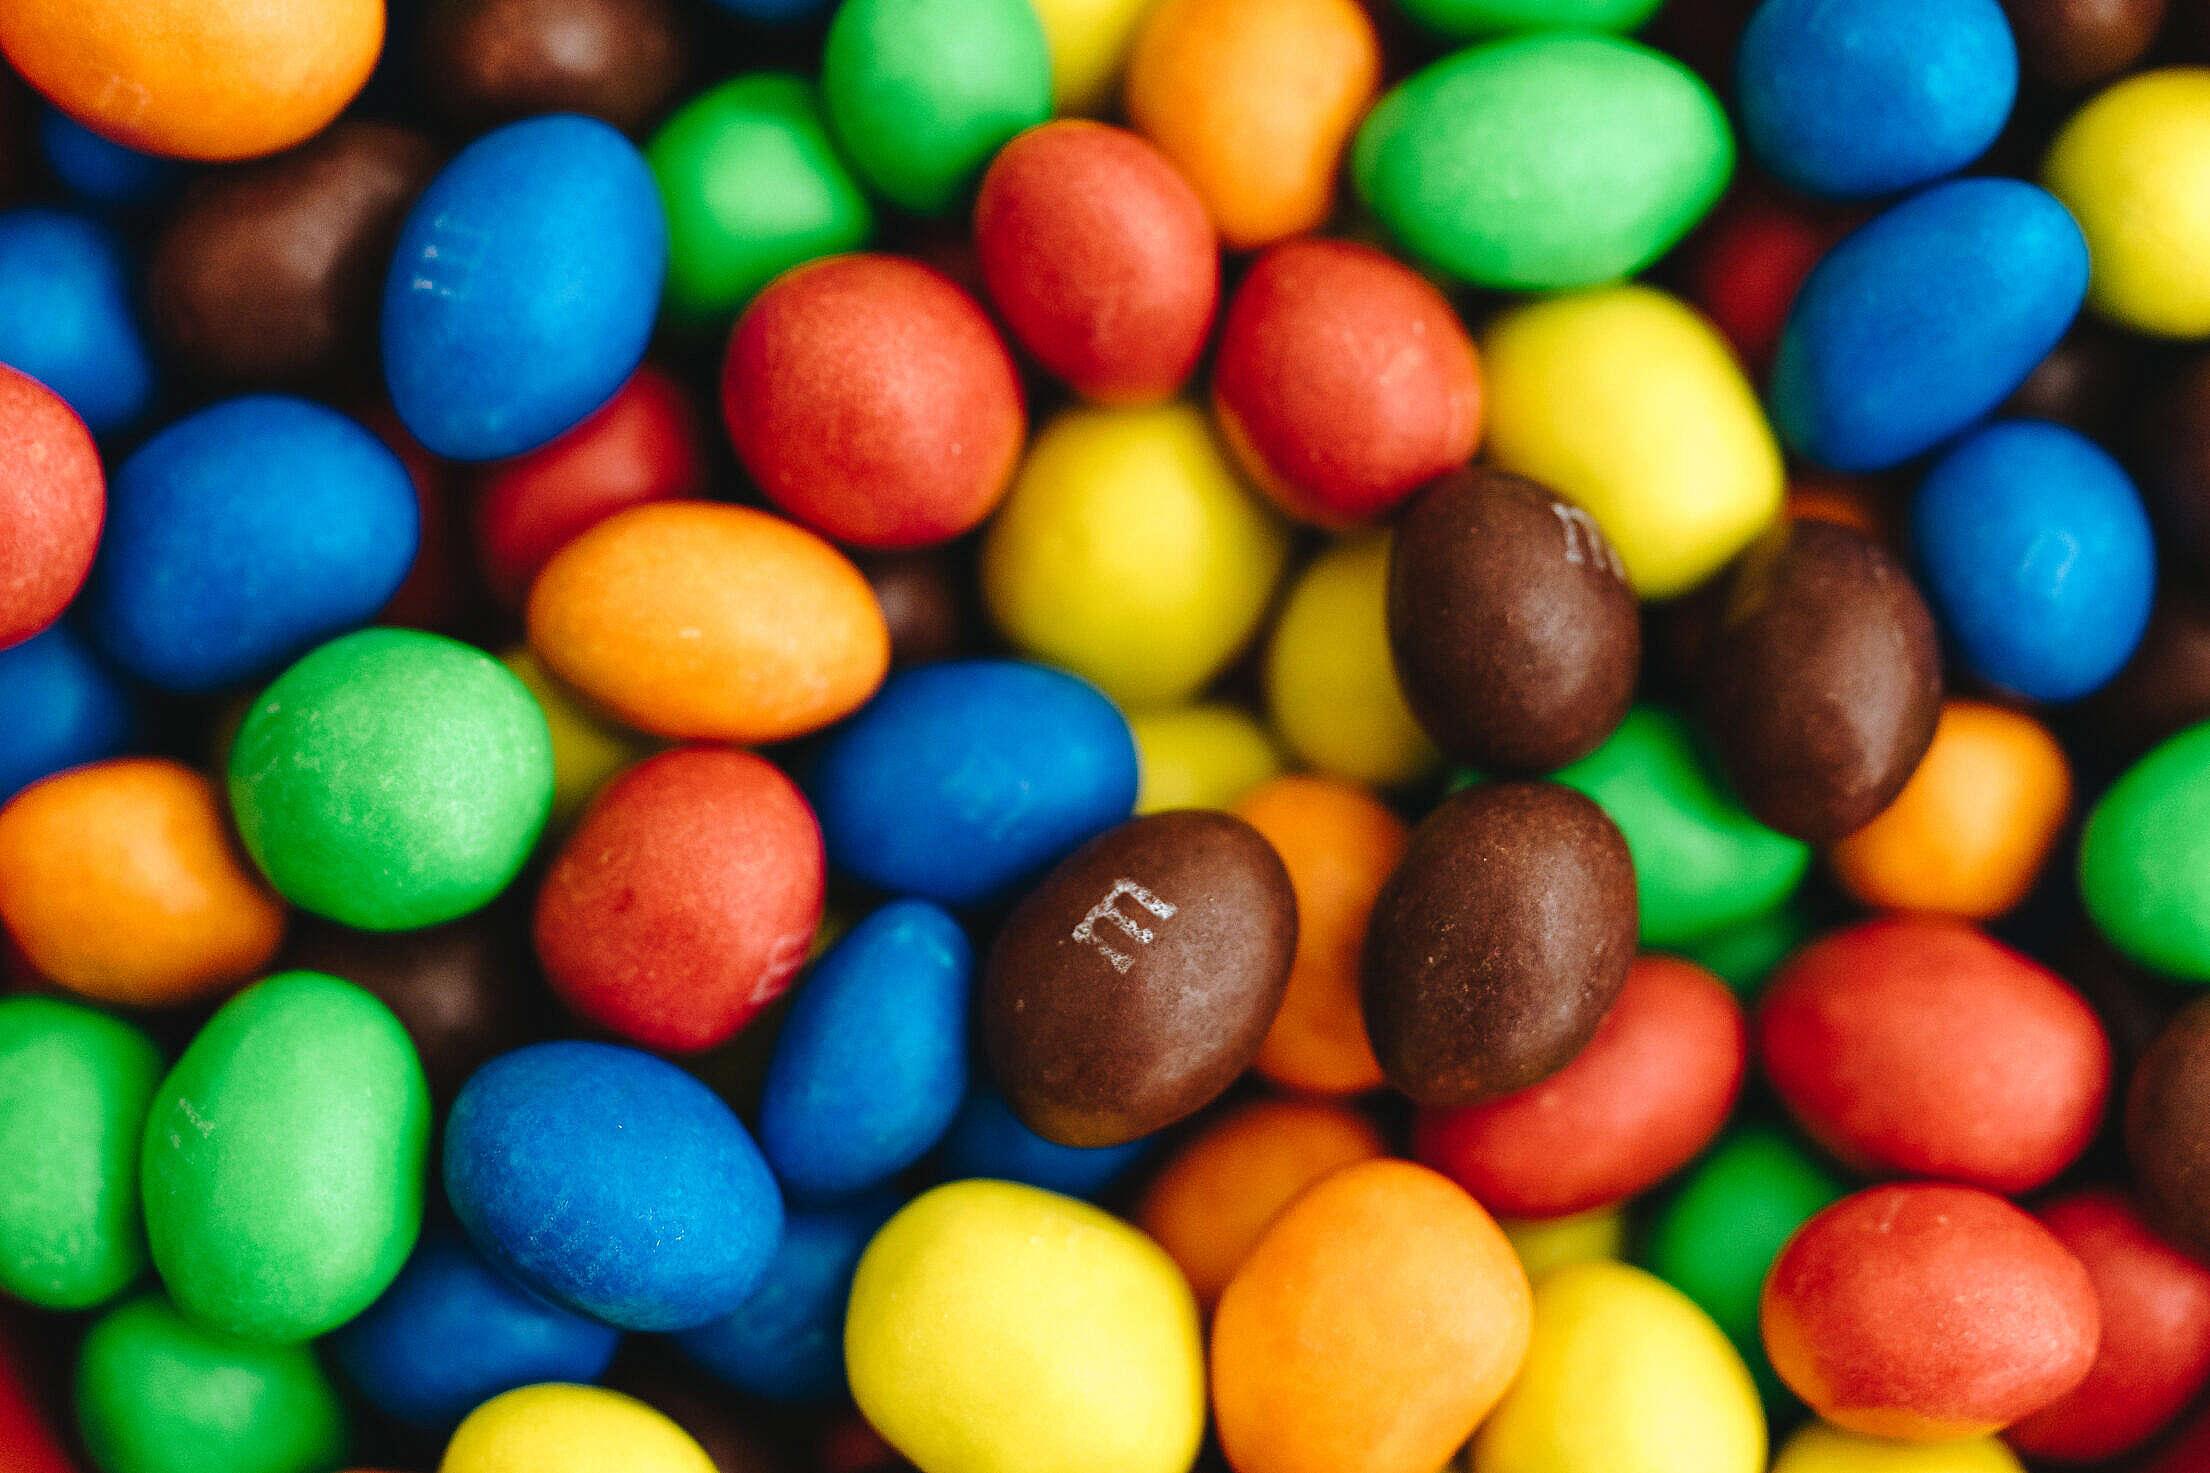 M&M's Peanut Chocolates Backgrounds Free Stock Photo